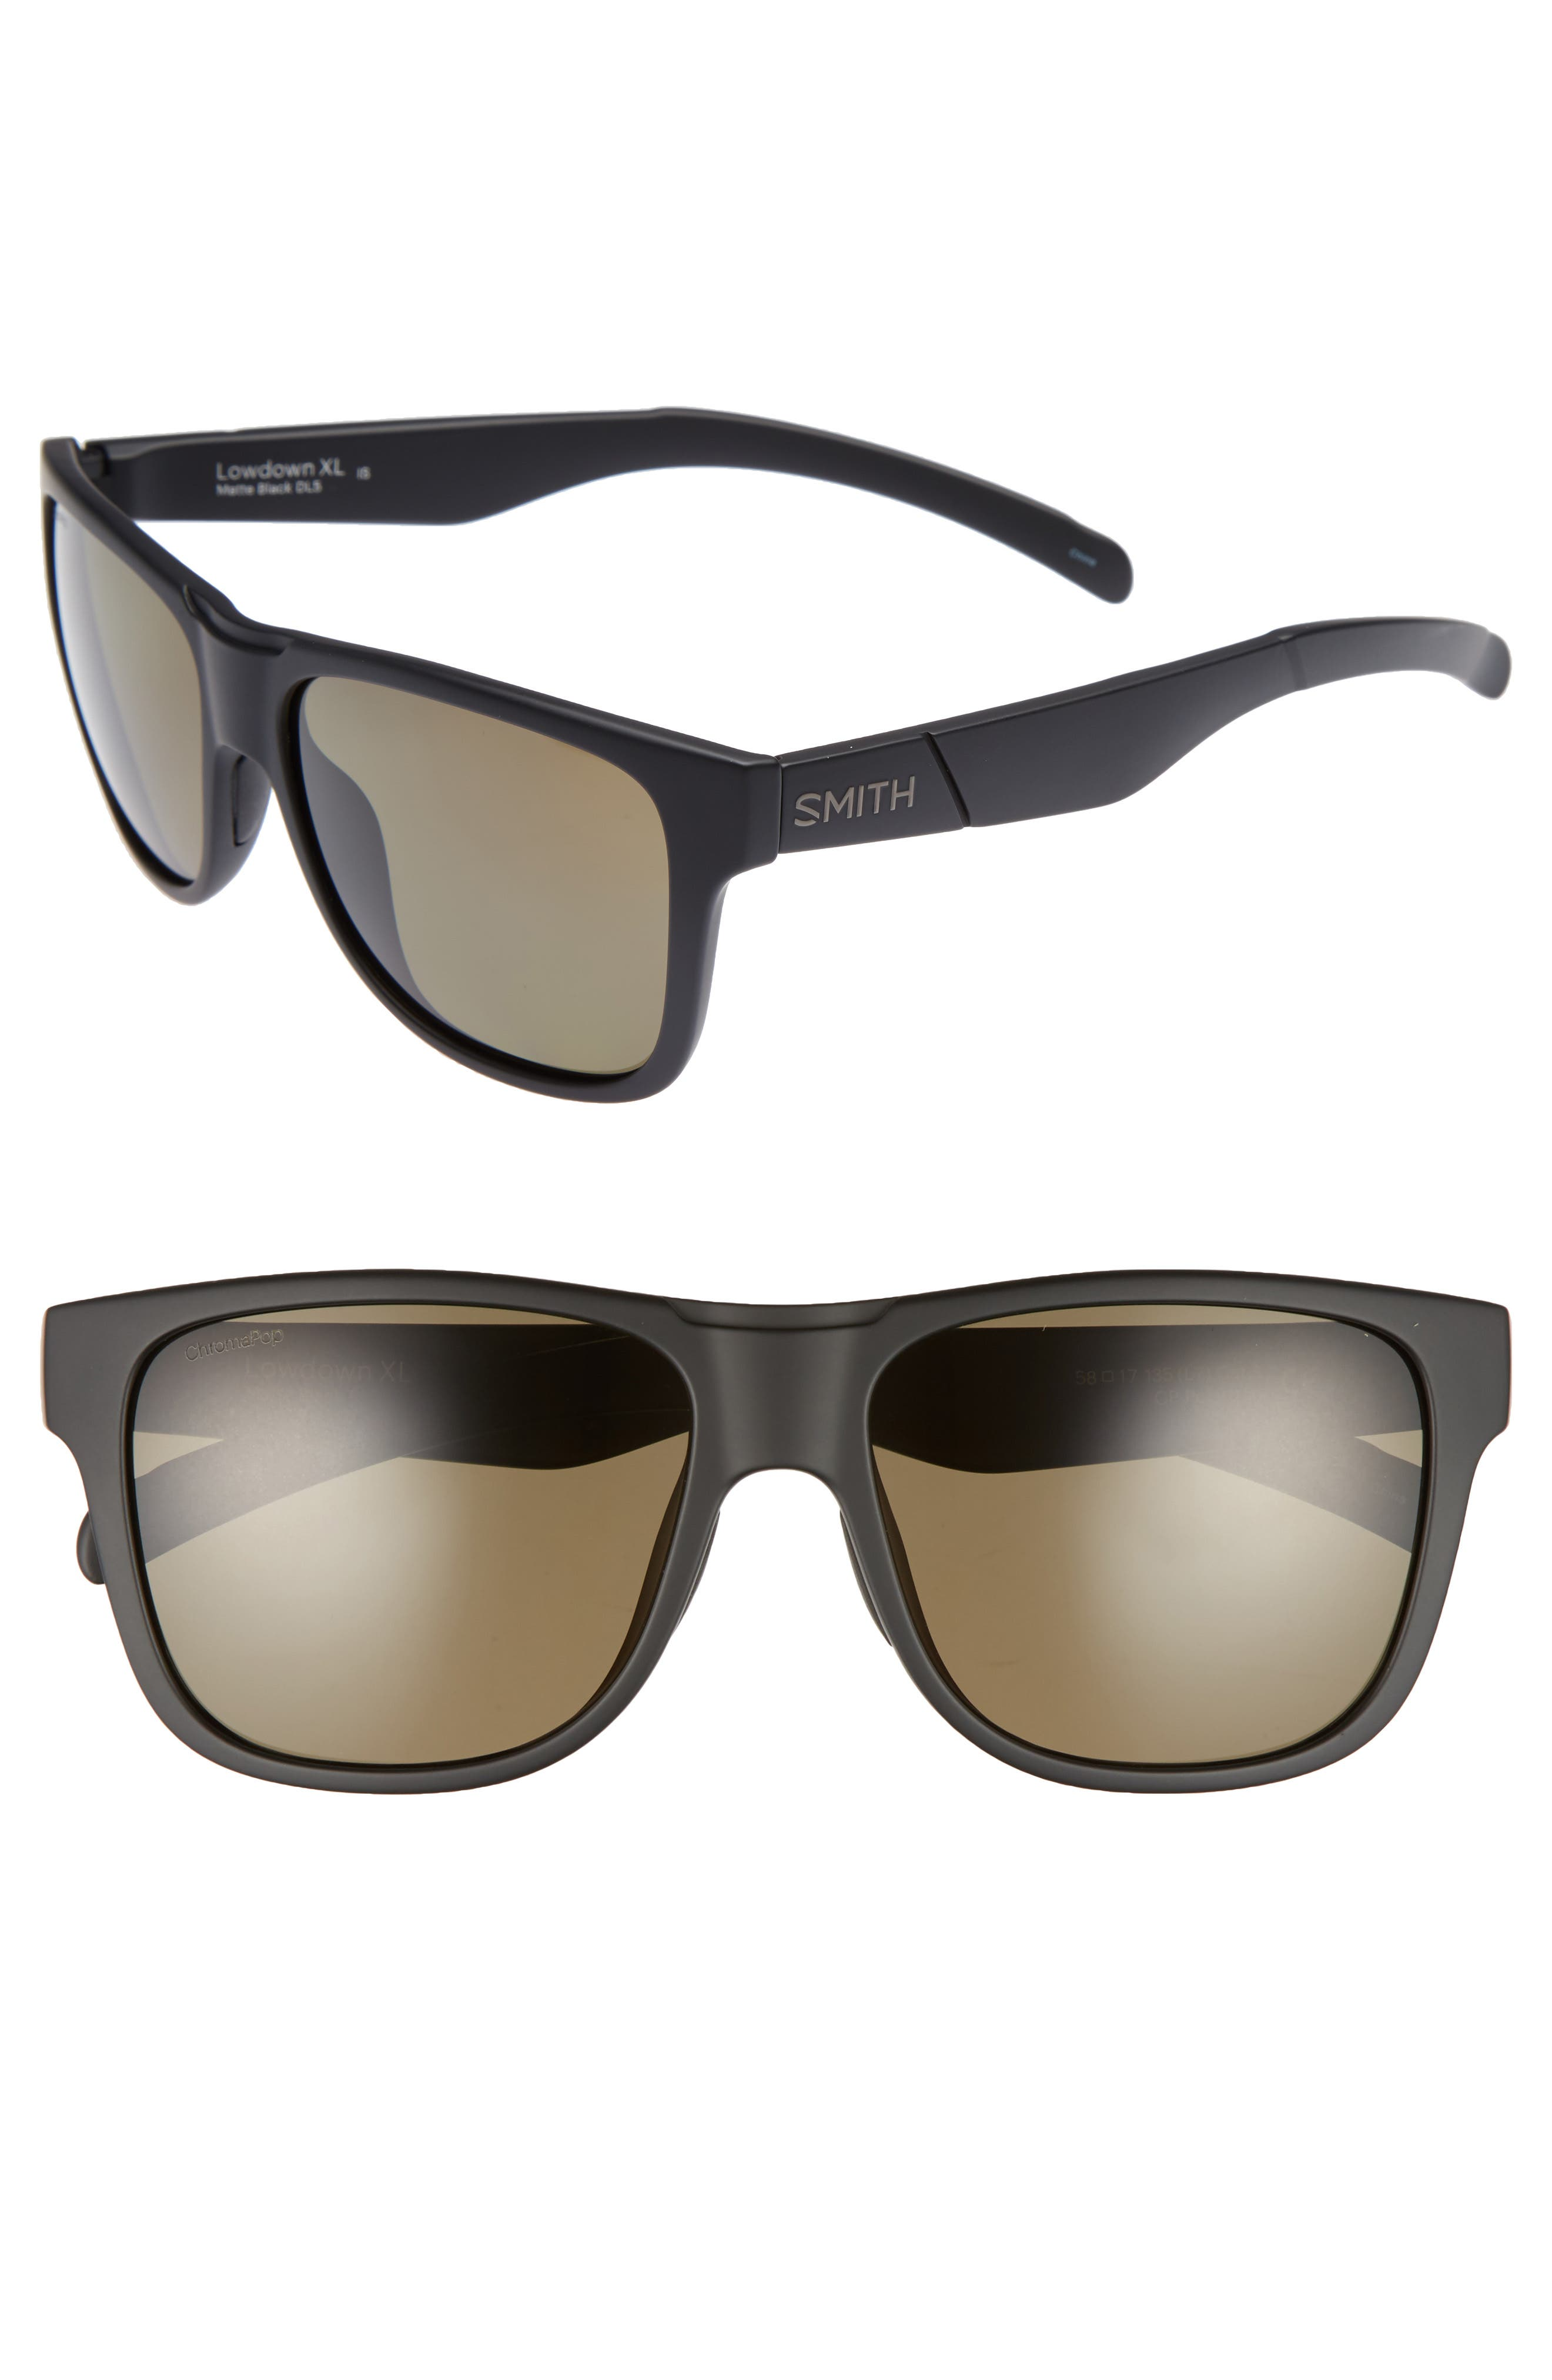 Lowdown XL 58mm Polarized Sunglasses,                         Main,                         color, Matte Black/ Gray Green